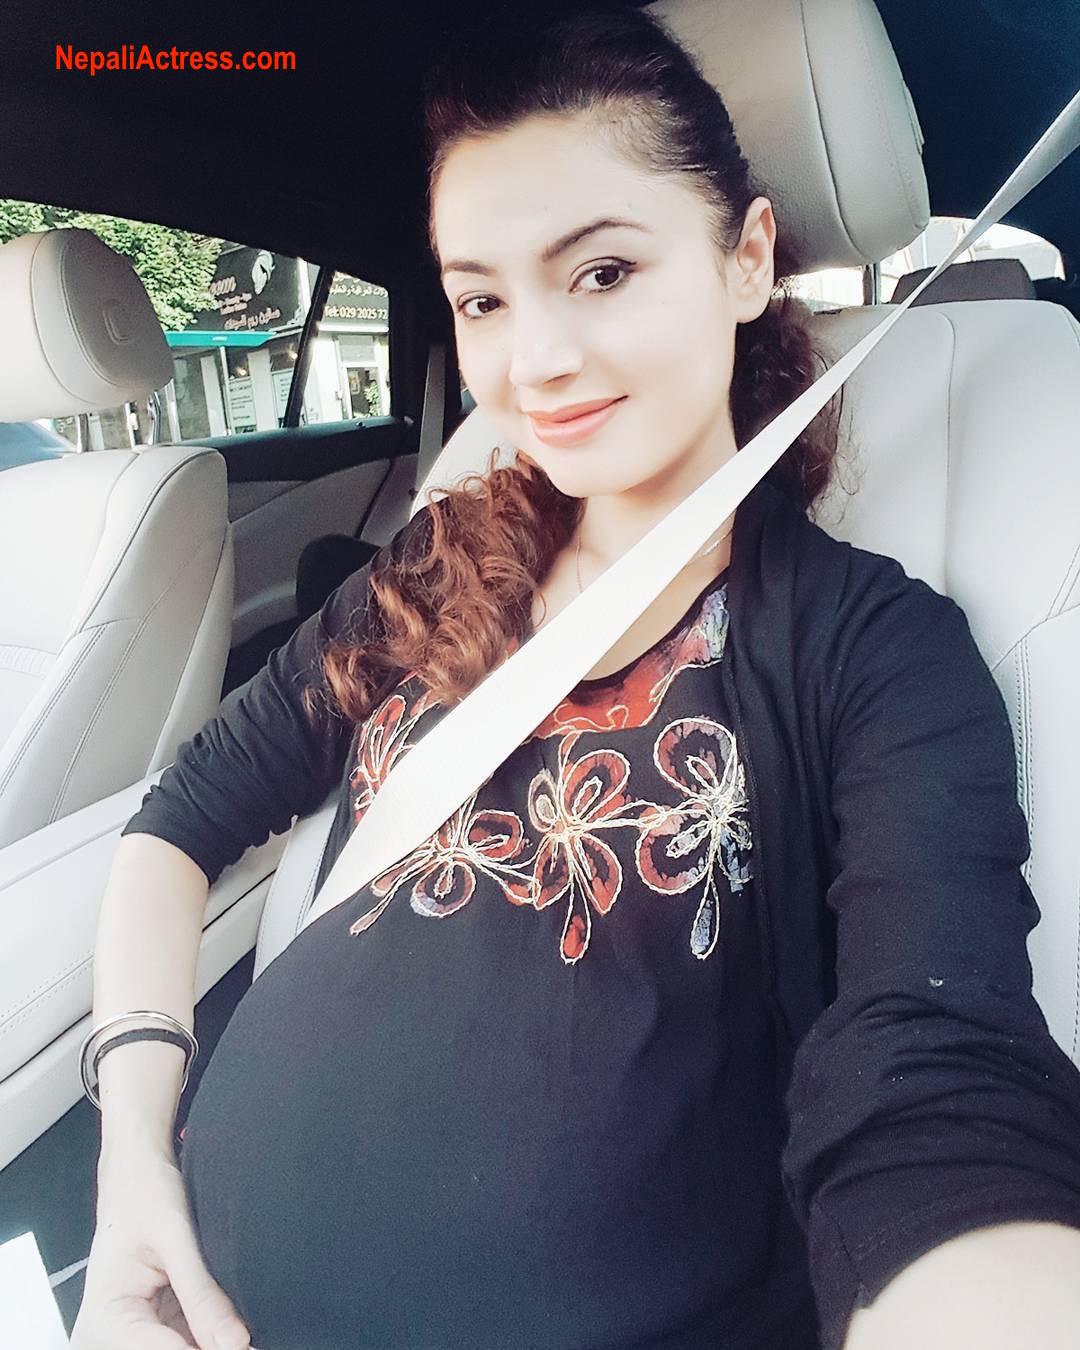 Simpal Khanal pregnant